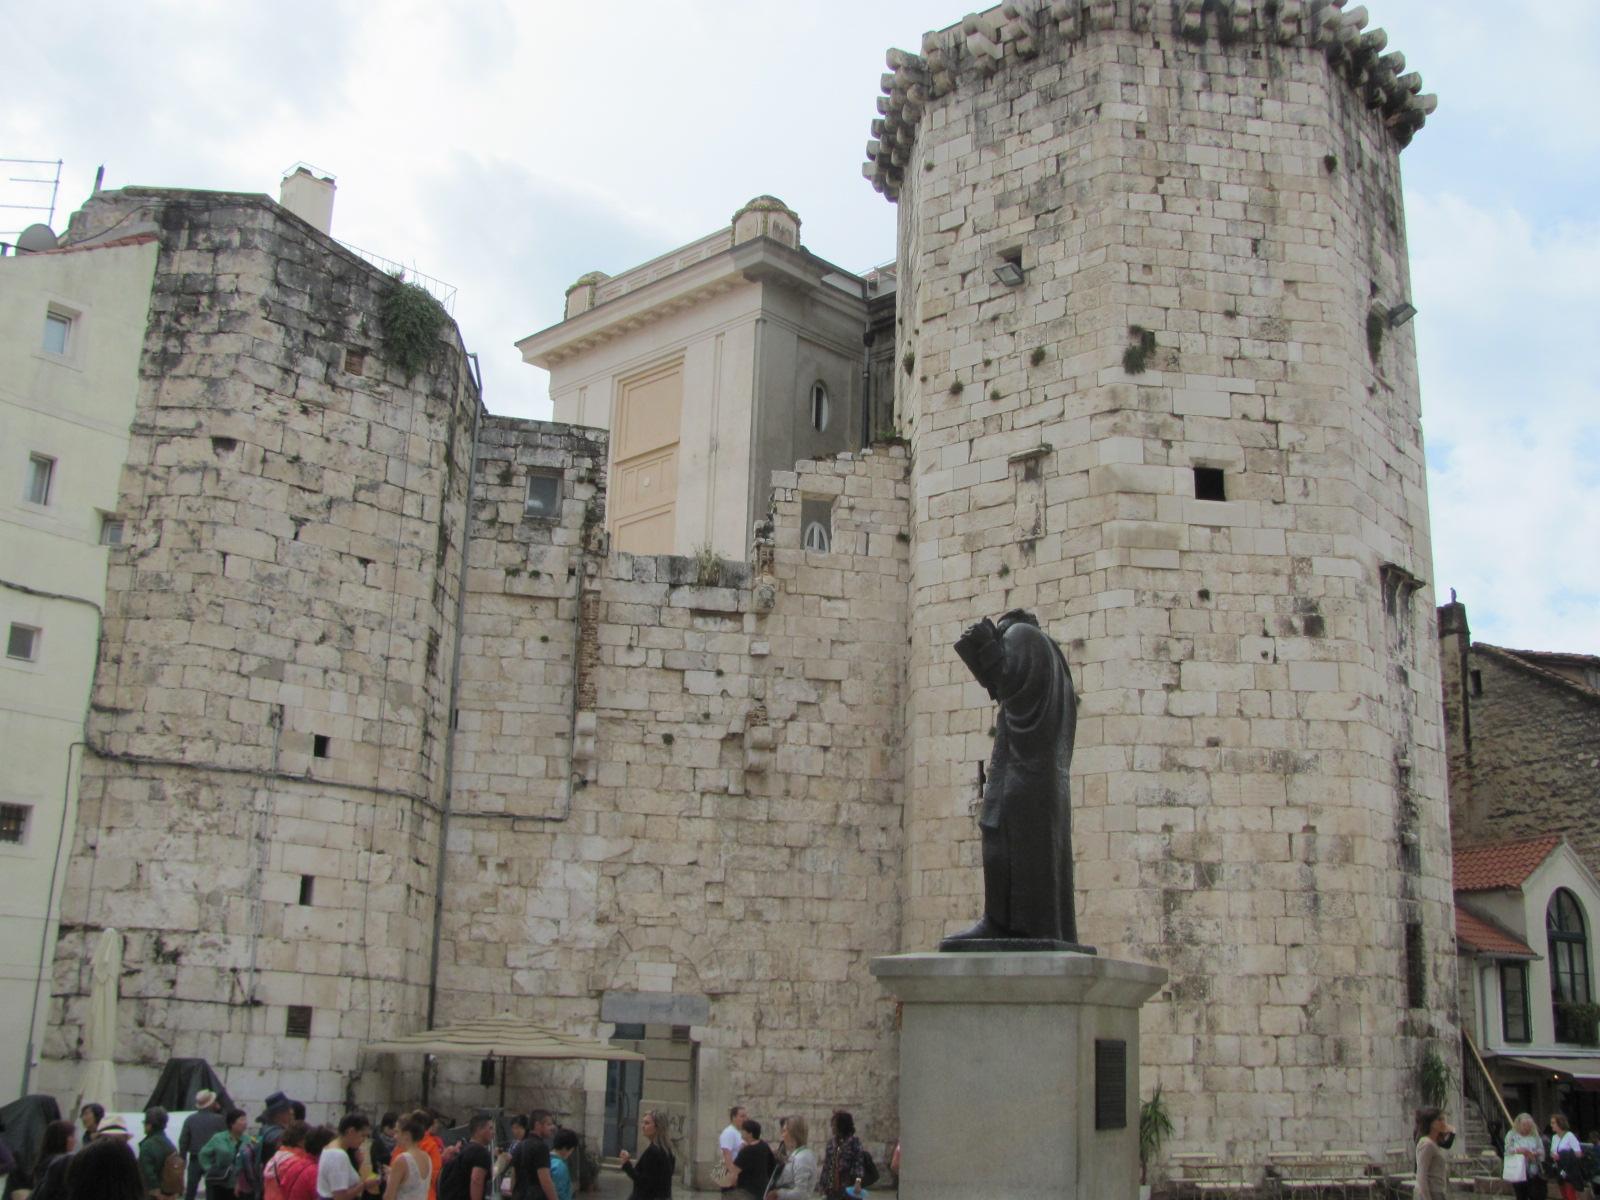 Hrvoje's Tower